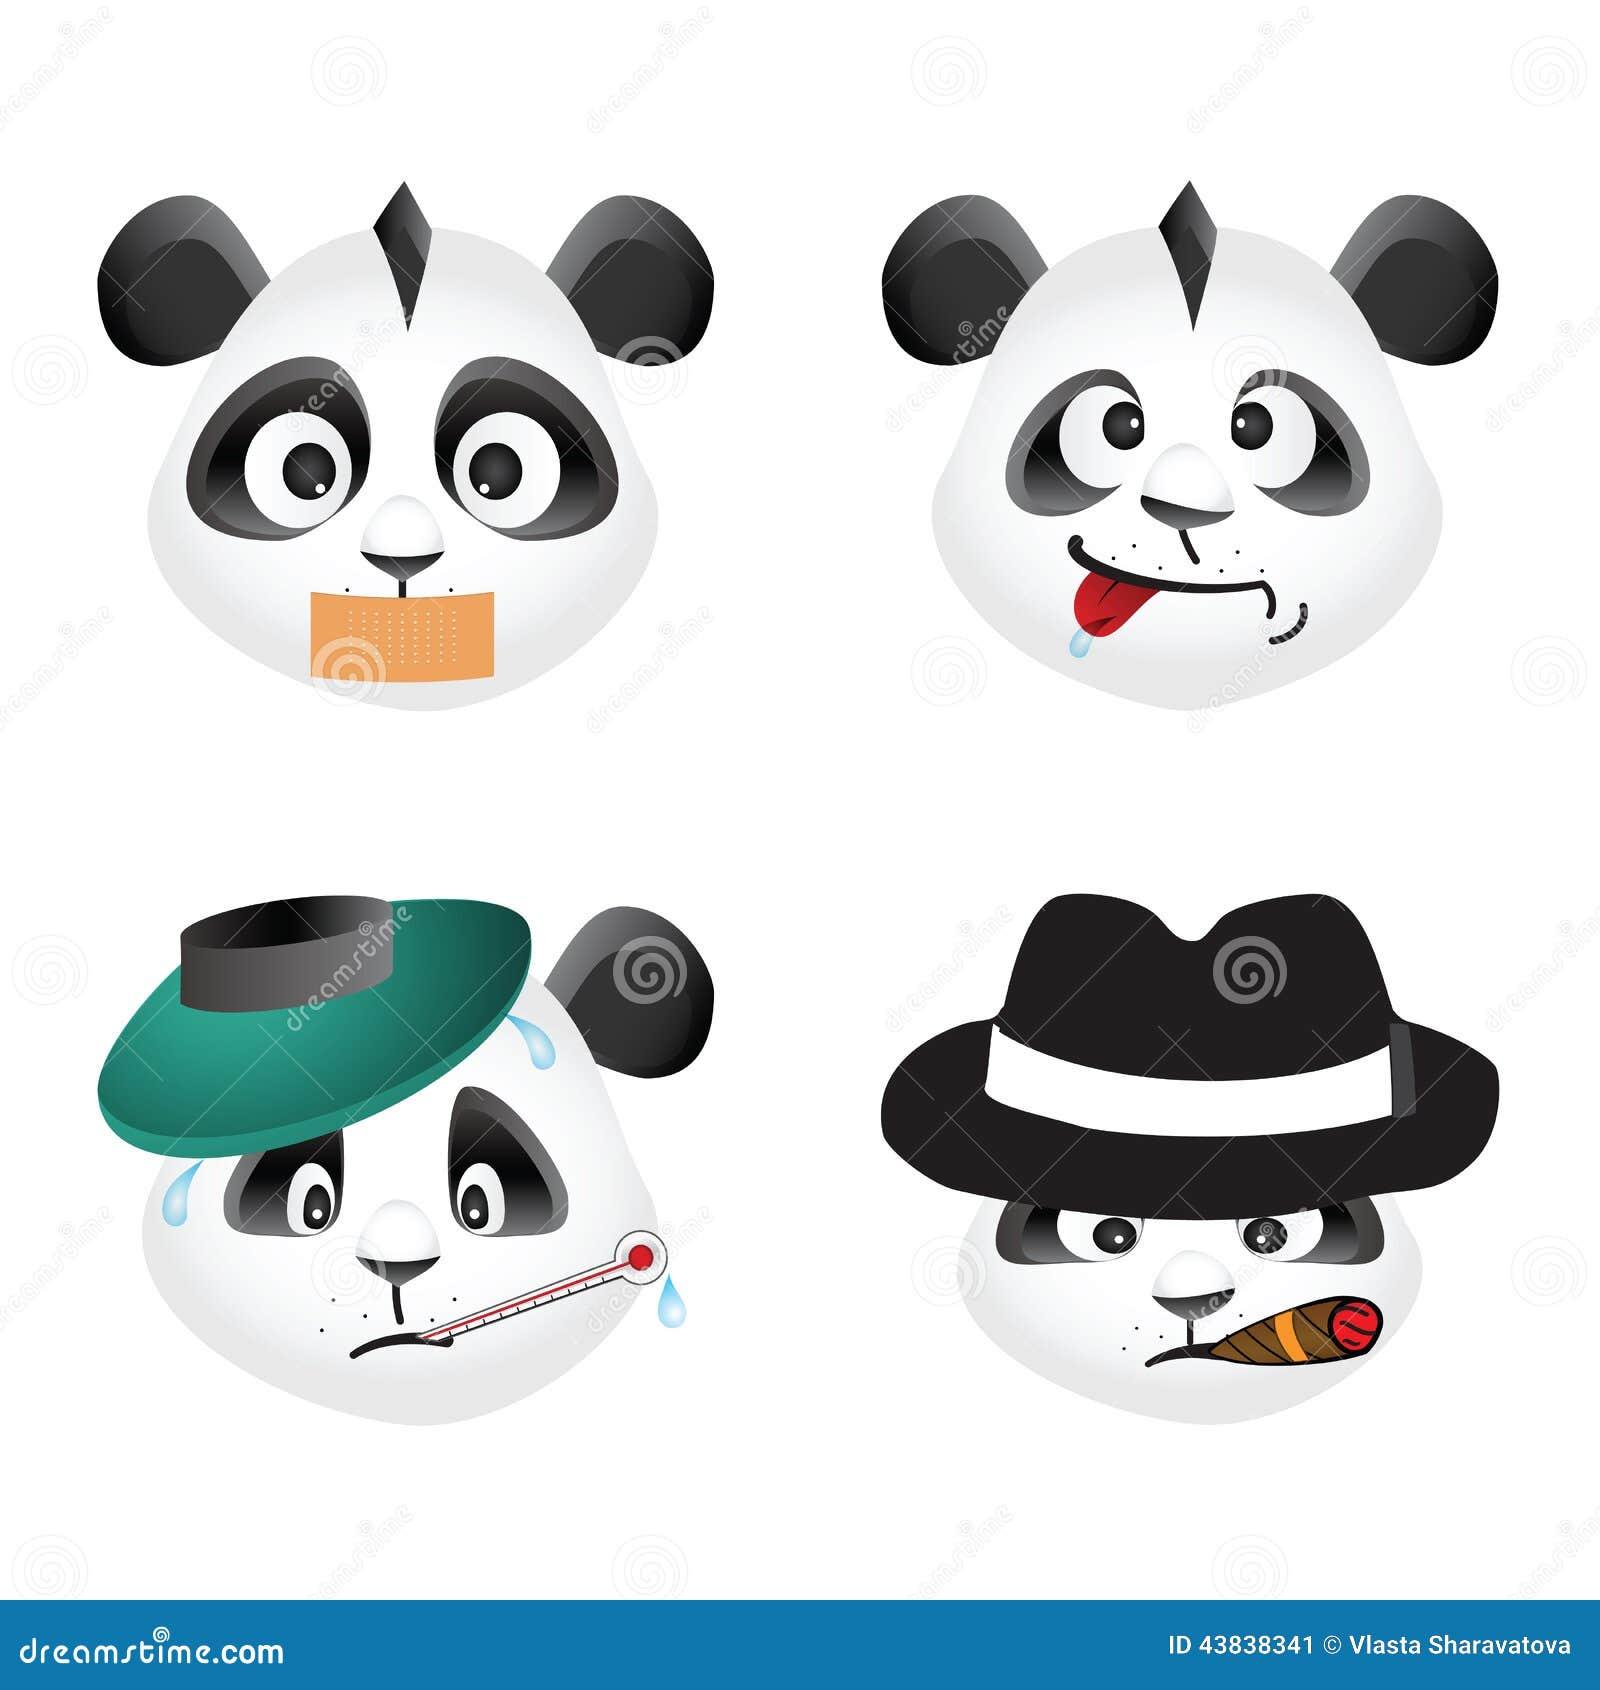 Panda Smiley Face Icons Set. Stock Photo